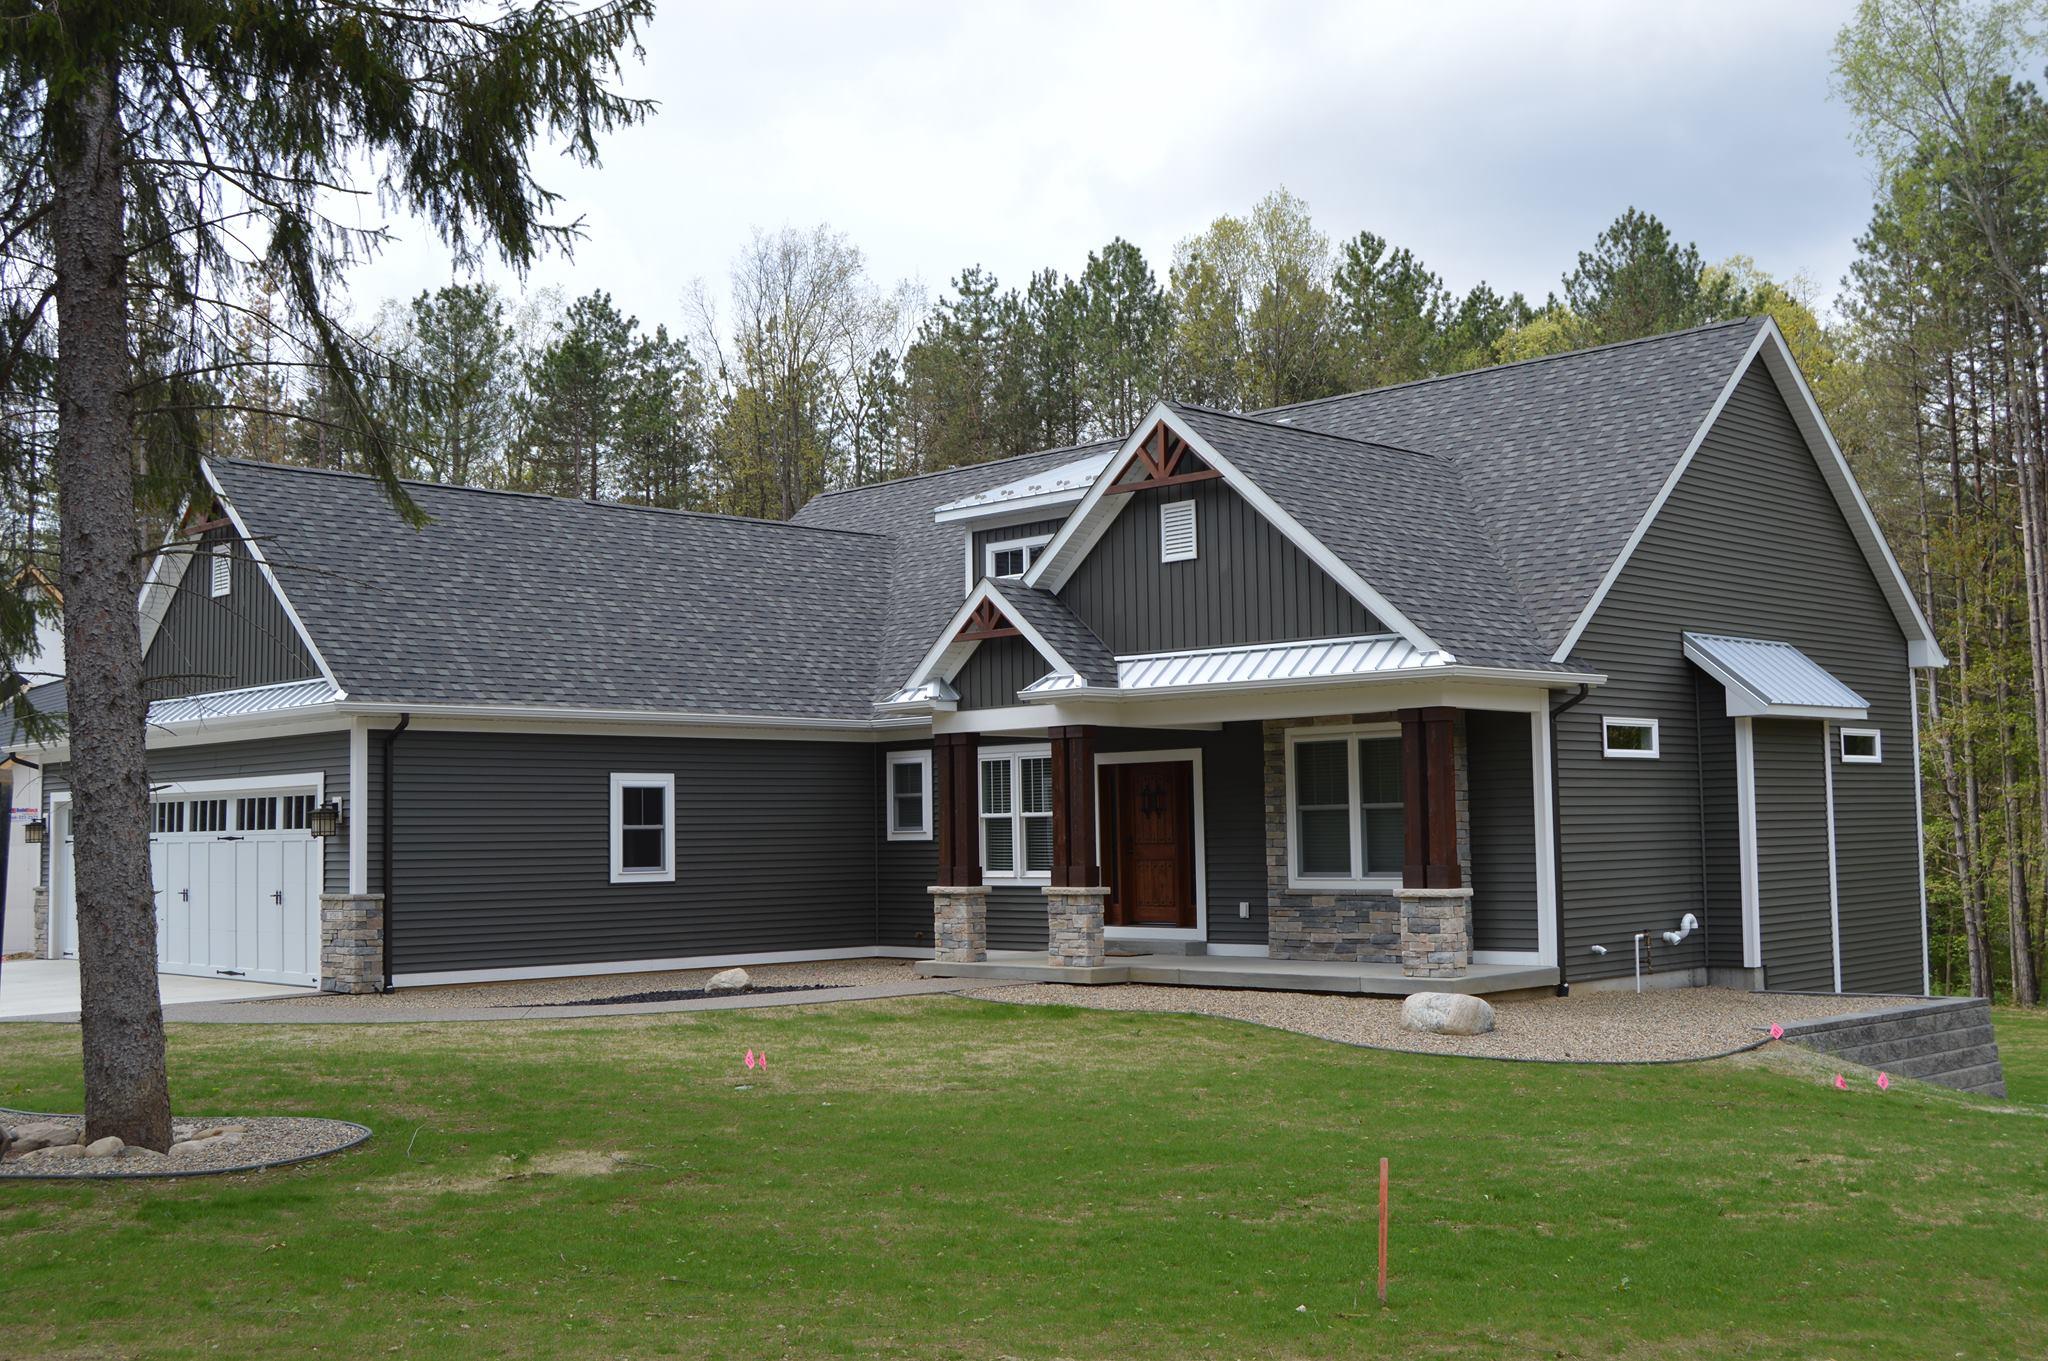 Home Construction Basement Remodeling Kalamazoo Mi